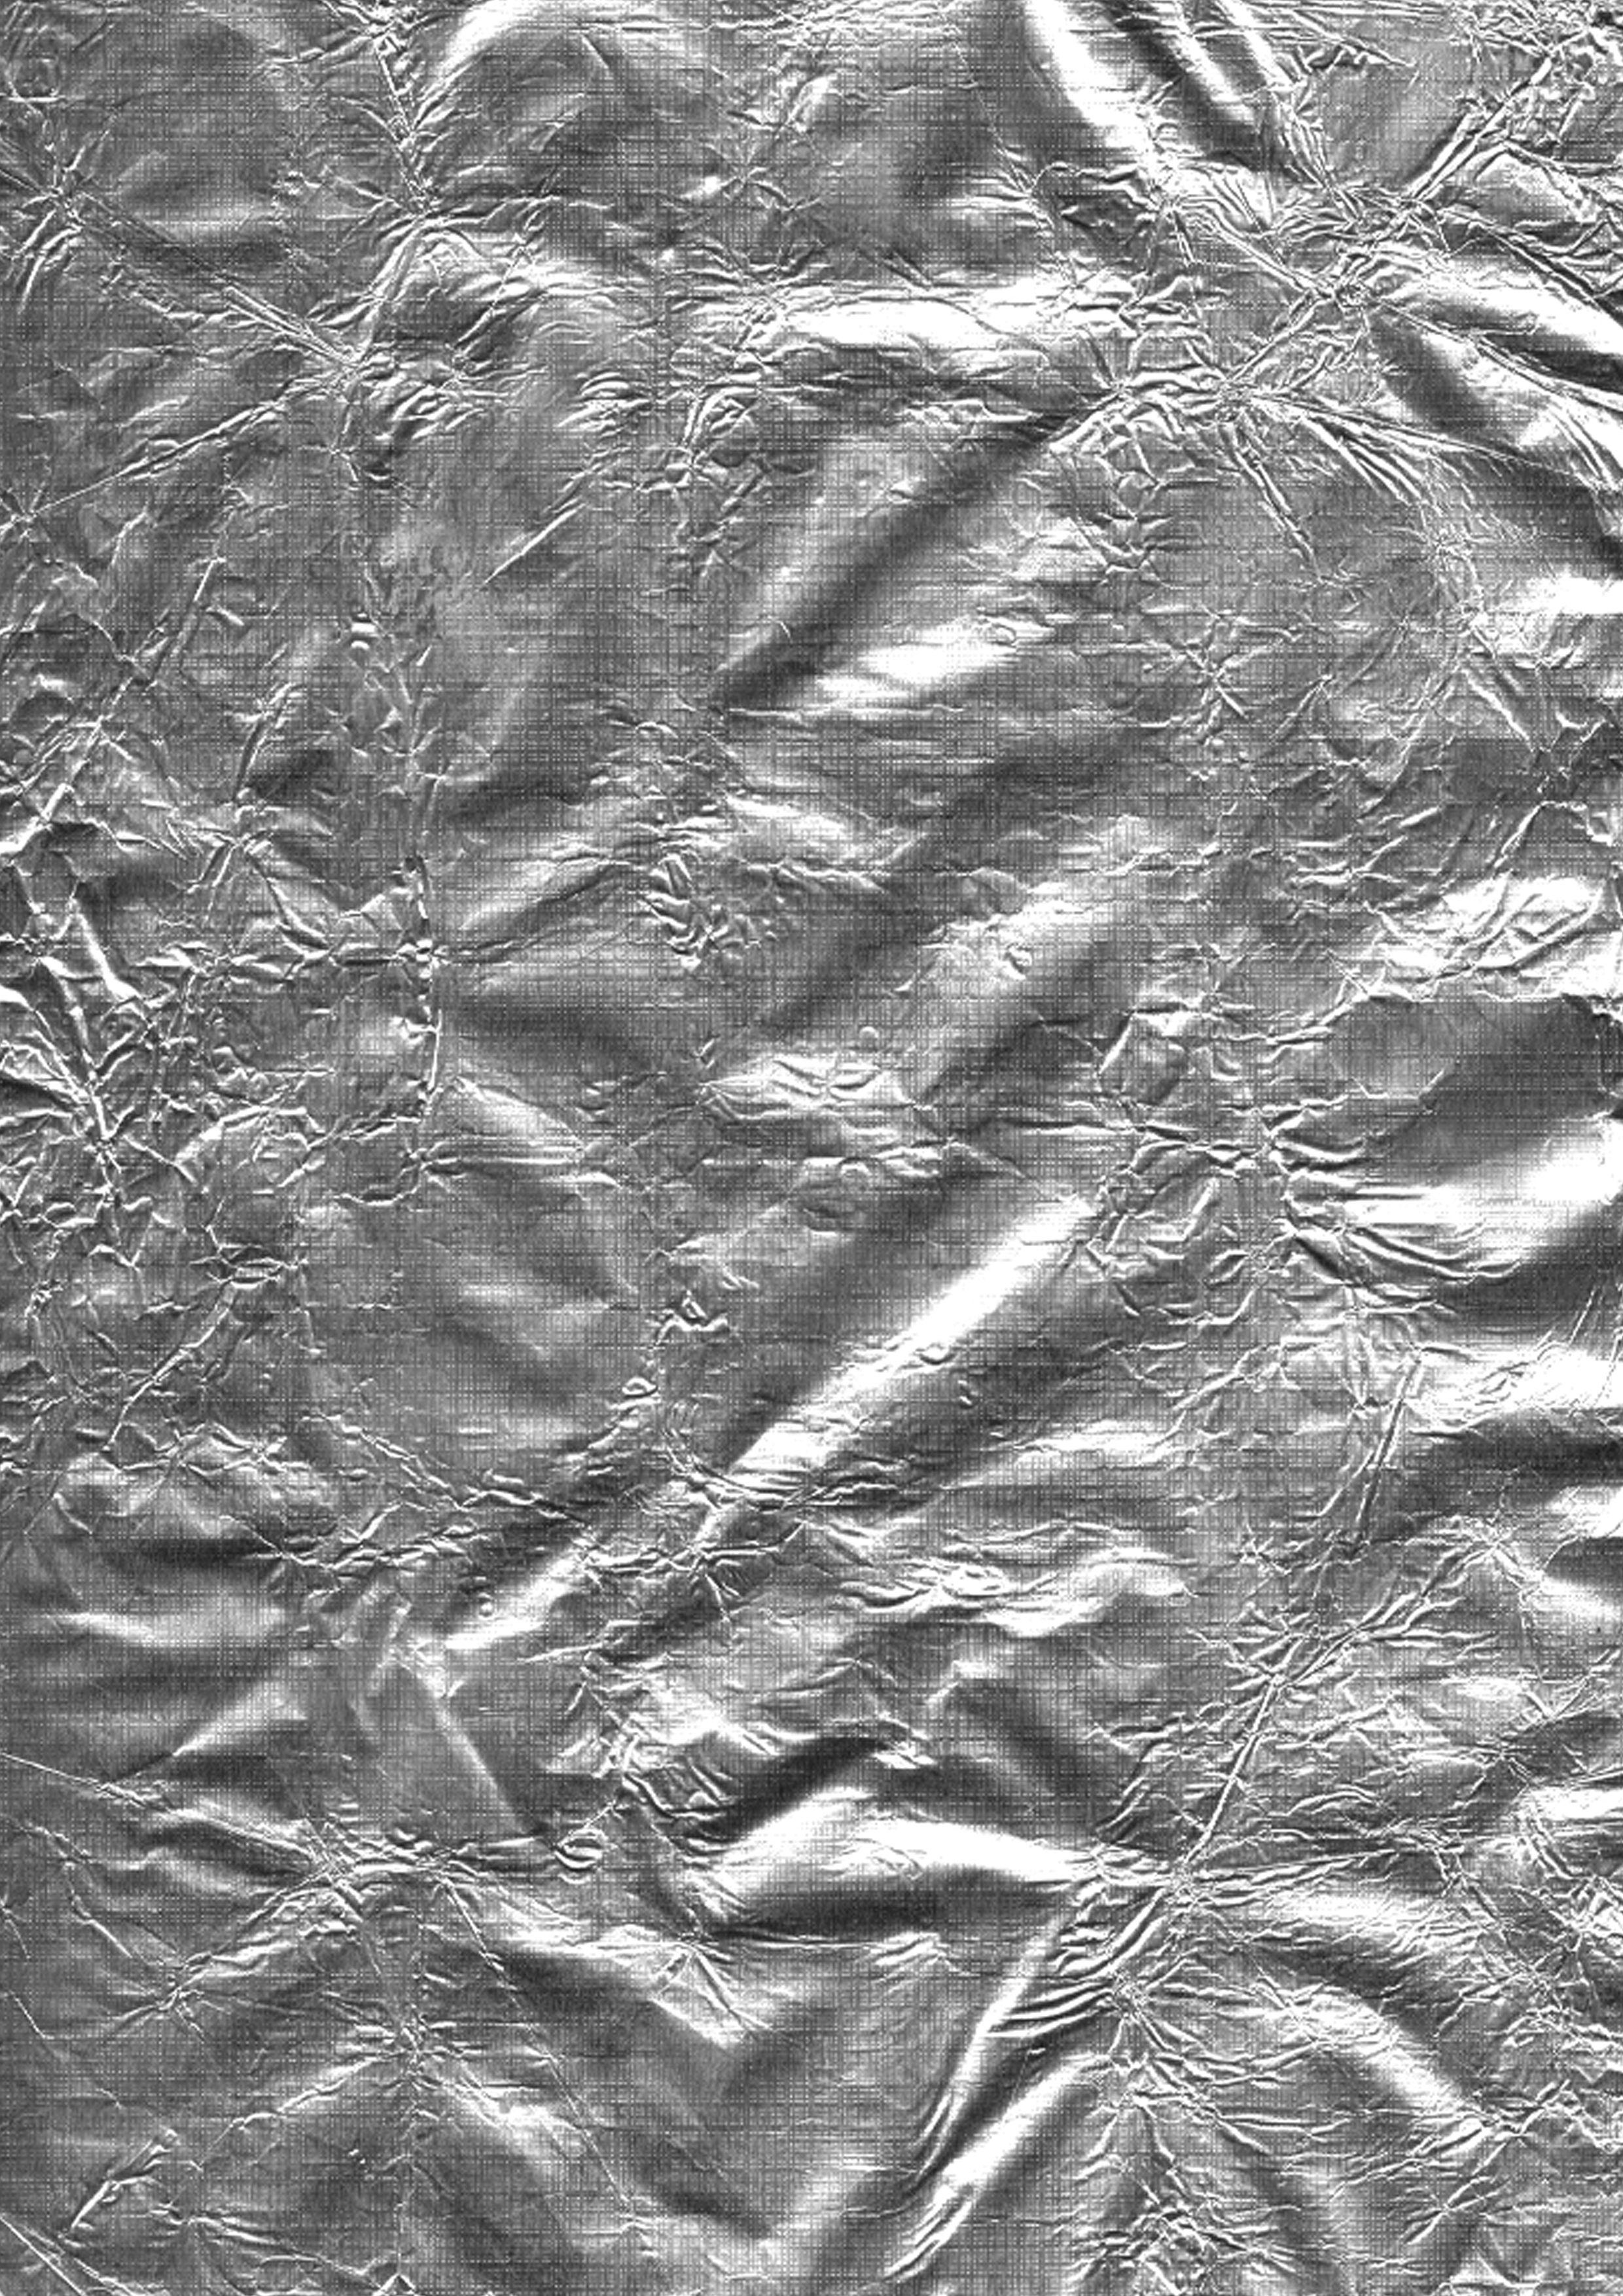 Metallic Texture LOVE THIS! Texture inspiration